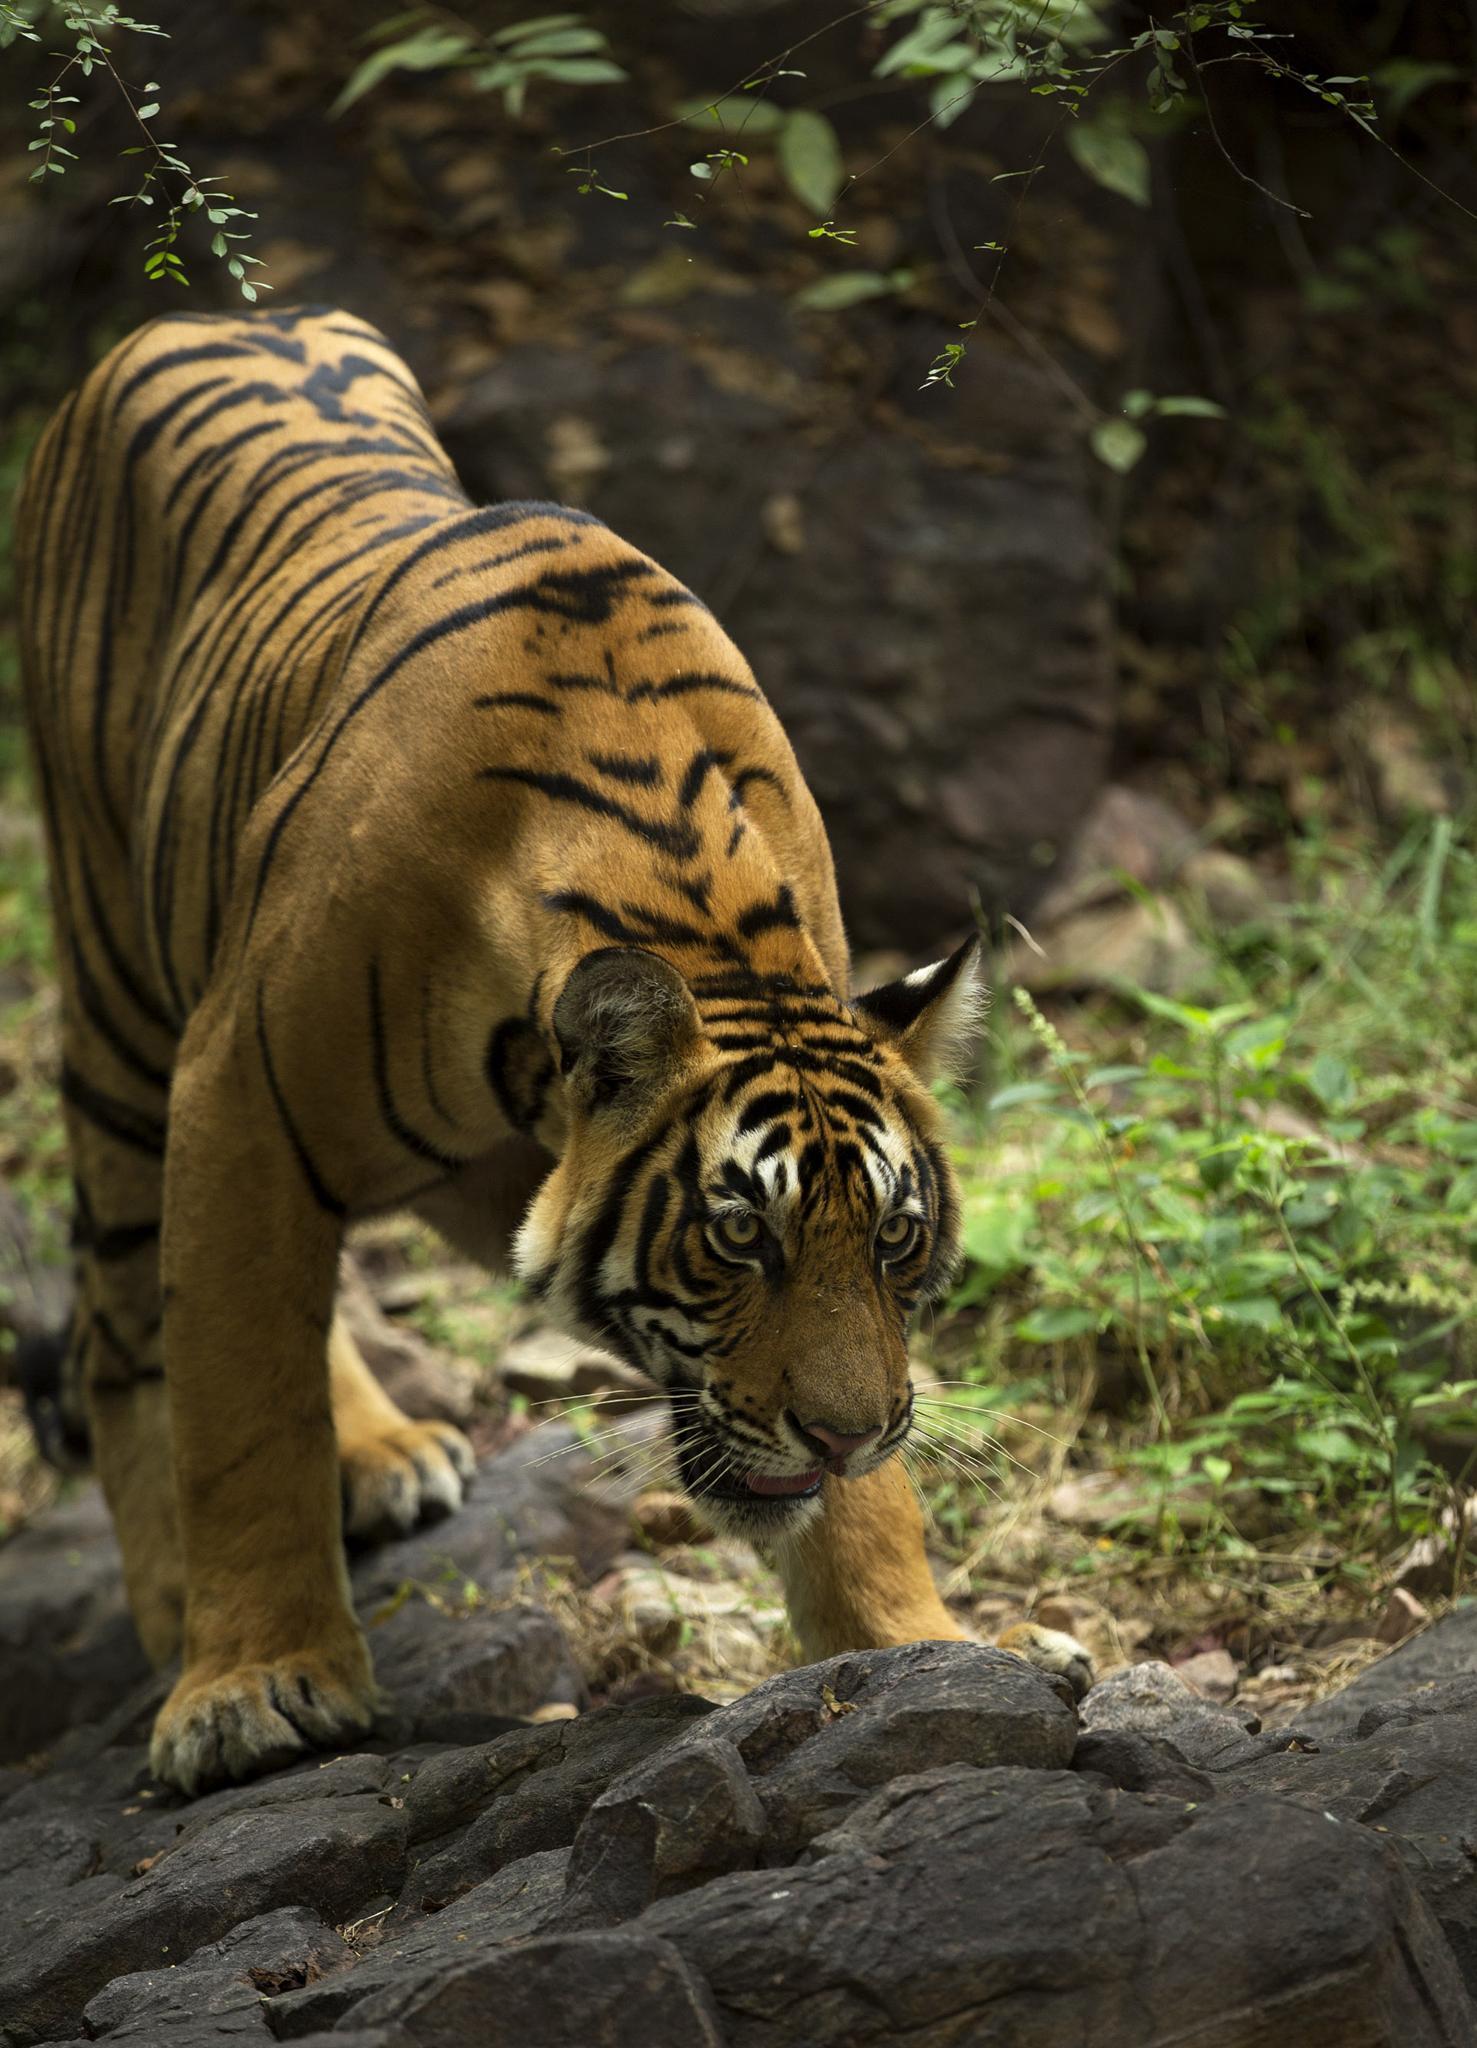 #bengaltiger #indianwildlife #tiger by Sumant Pinnamaneni